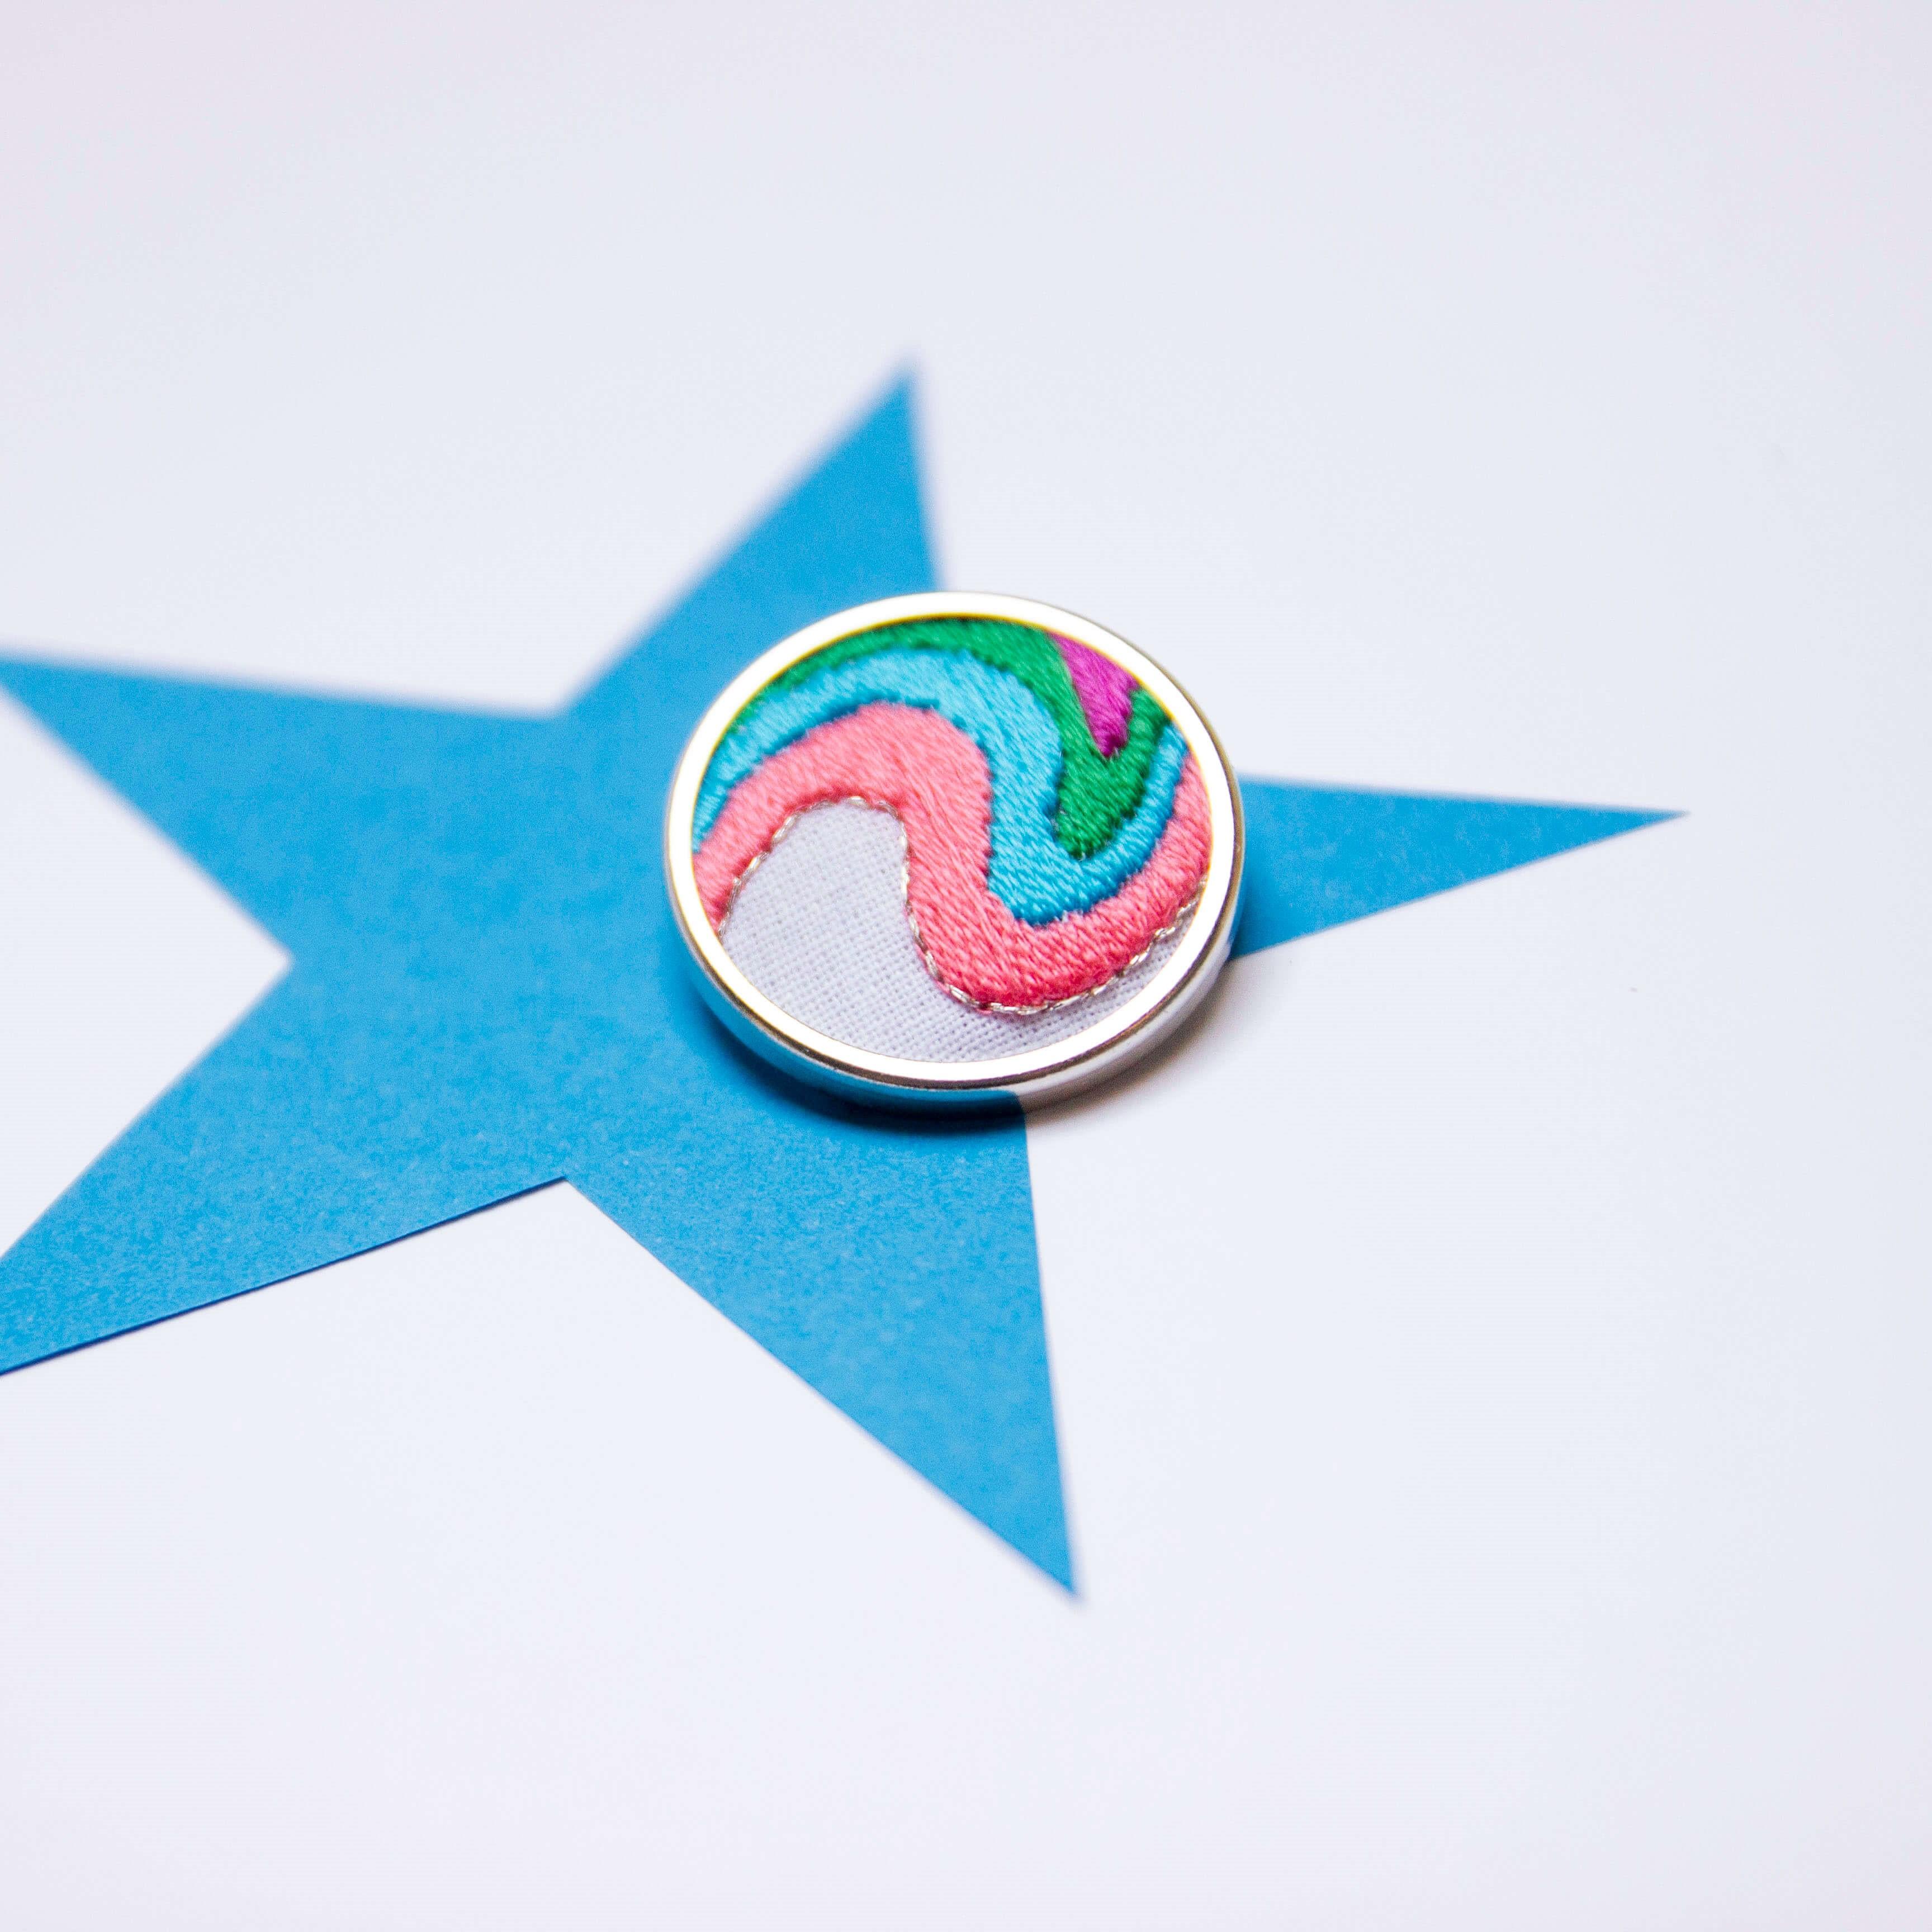 Lauren Smith Embroidery Pin - Boogie Wonderland